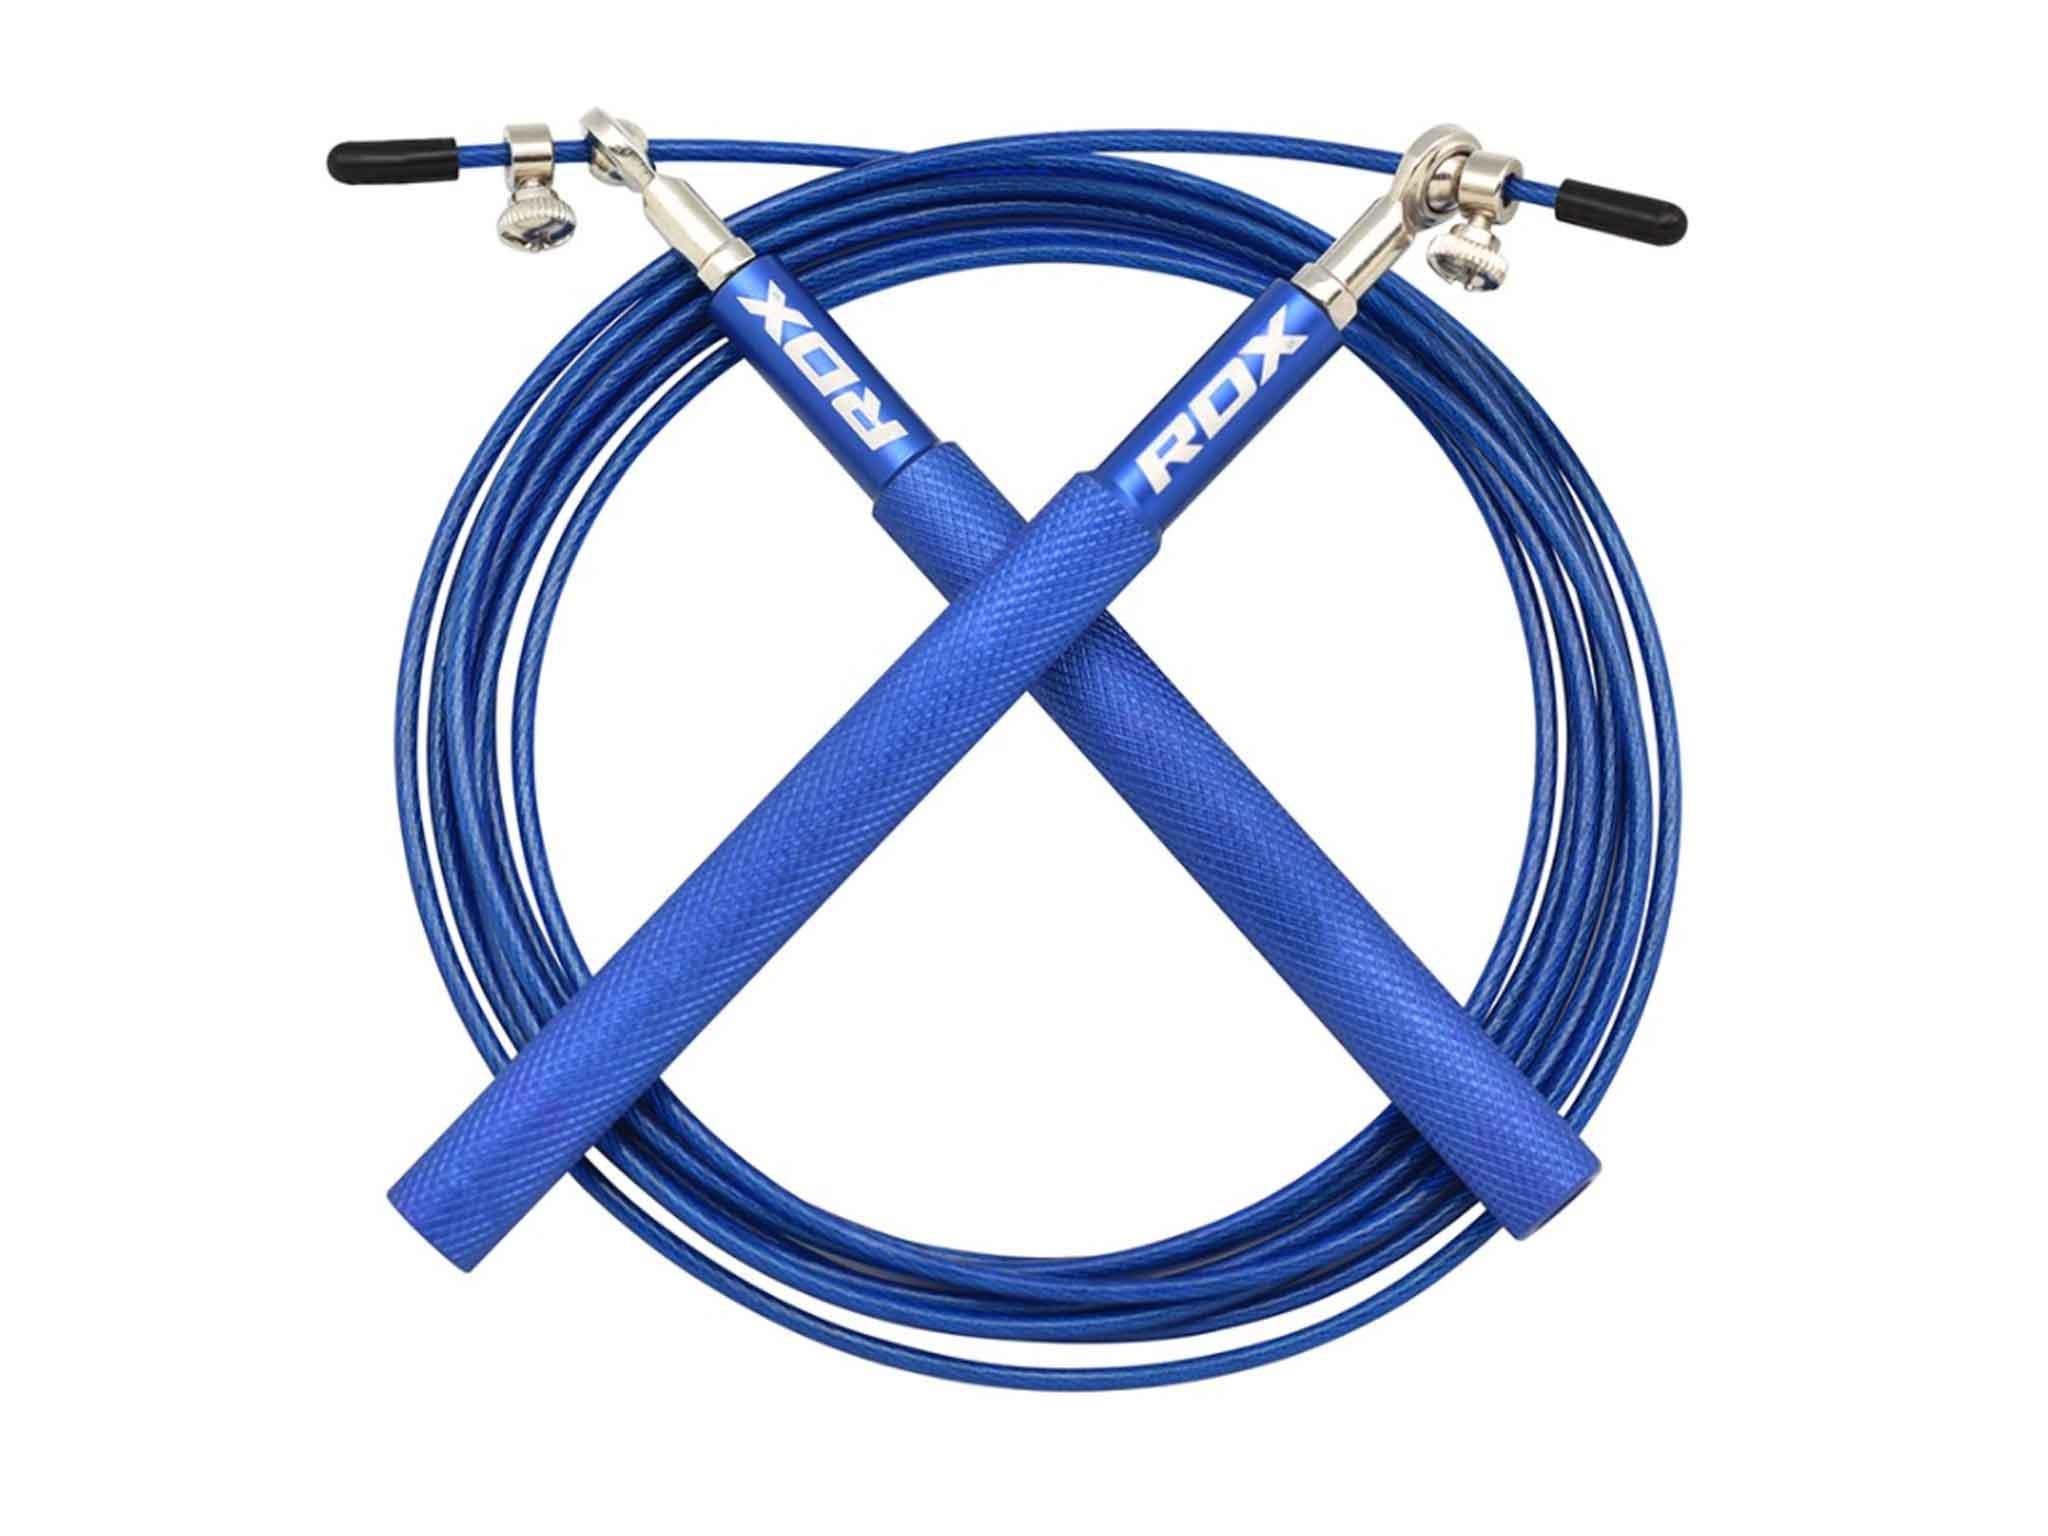 8 Best Skipping Ropes The Independent Wiring Garden Lights Uk Lightweight